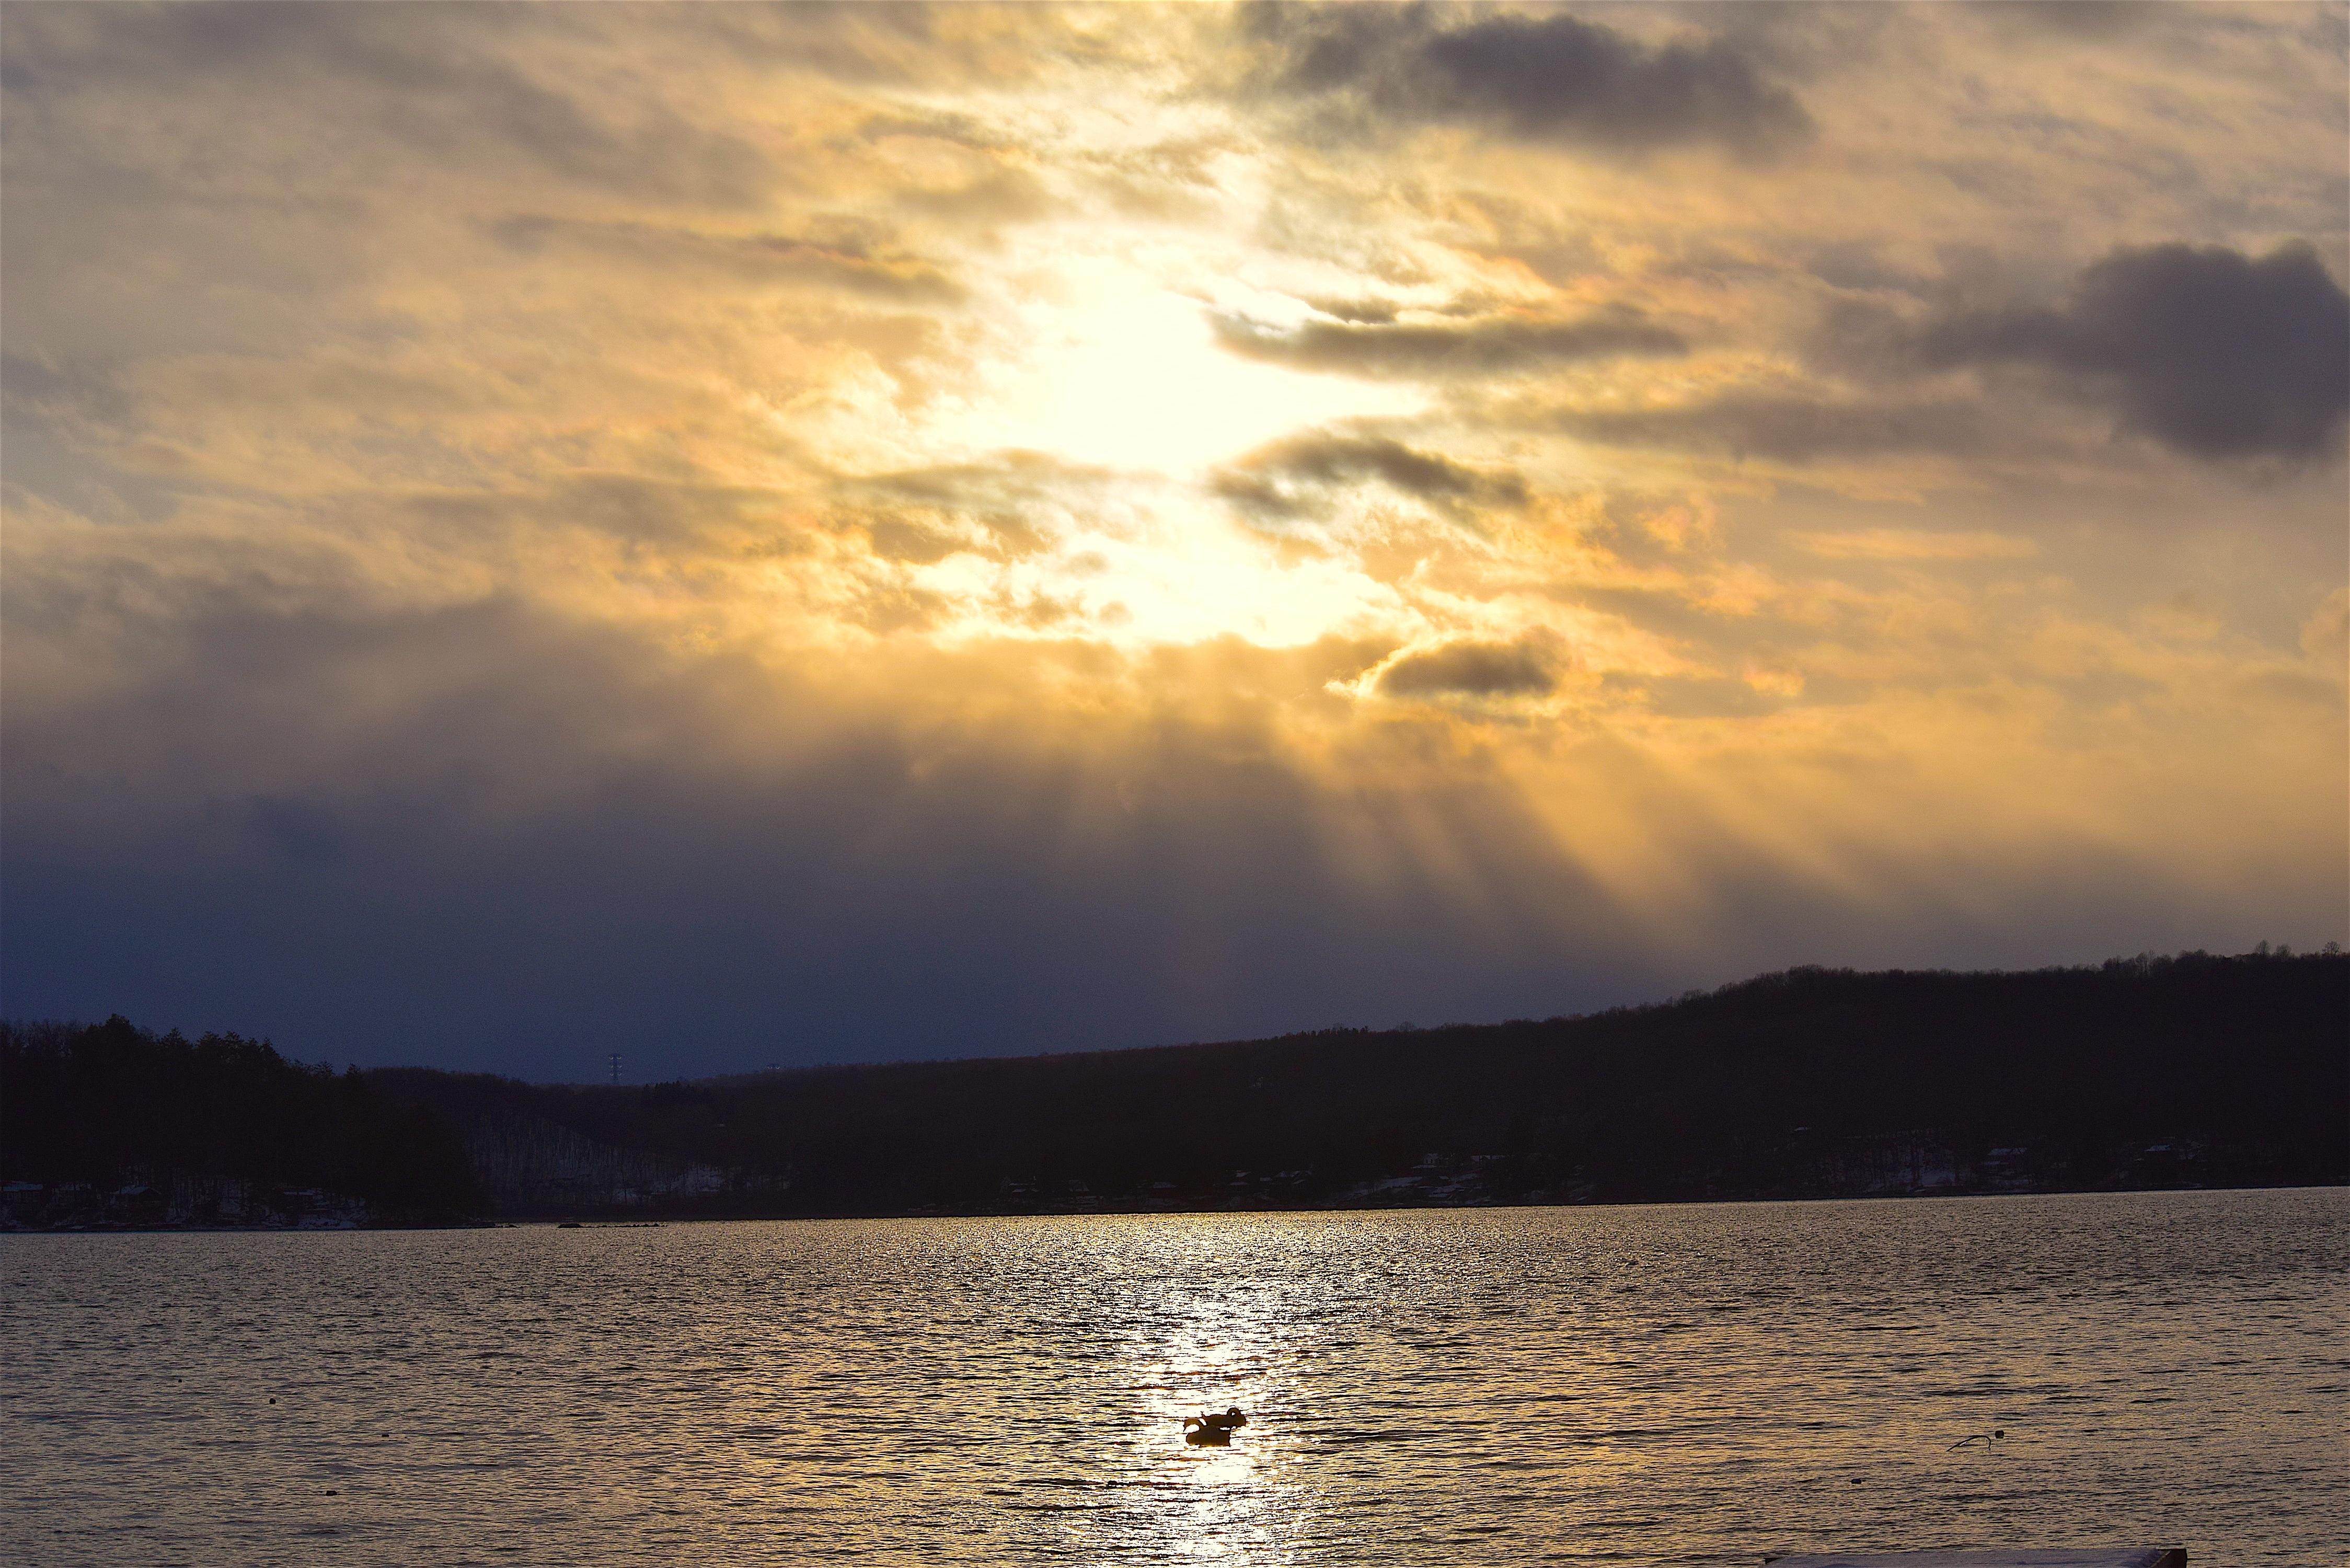 free images   beach  landscape  sea  coast  nature  outdoor  ocean  horizon  silhouette  light